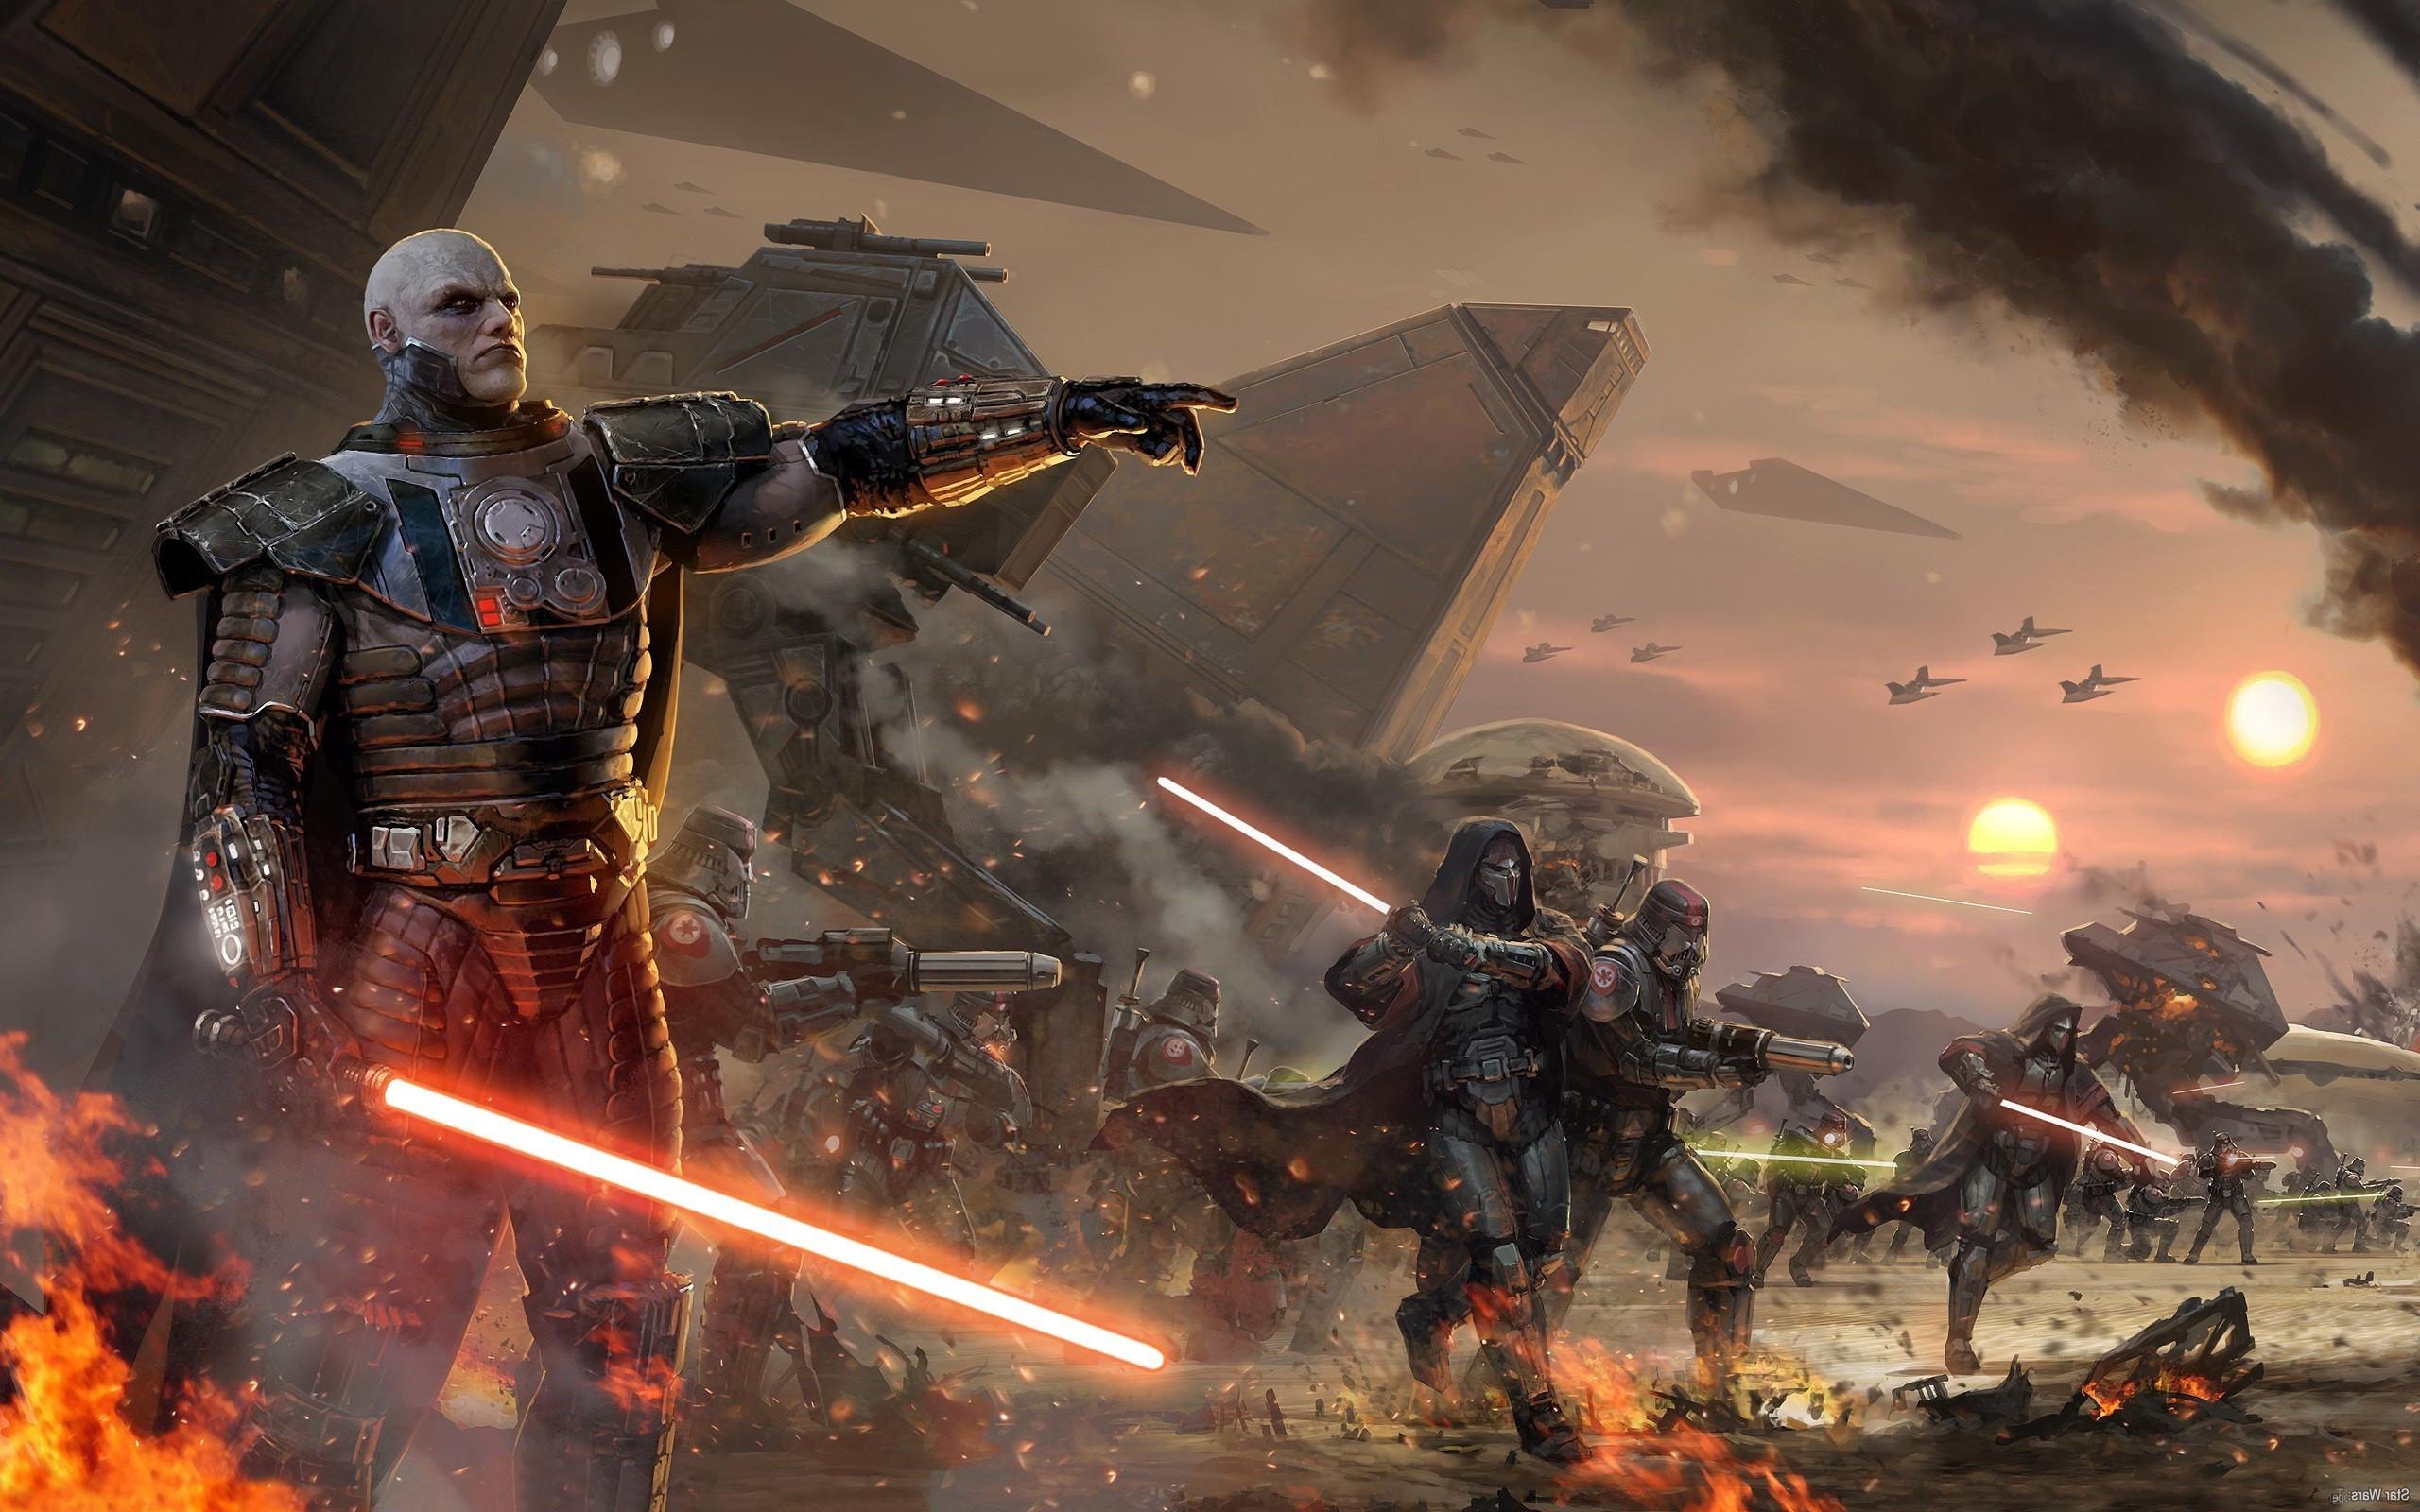 Star Wars Clone Wars Wallpaper Wallpapertag